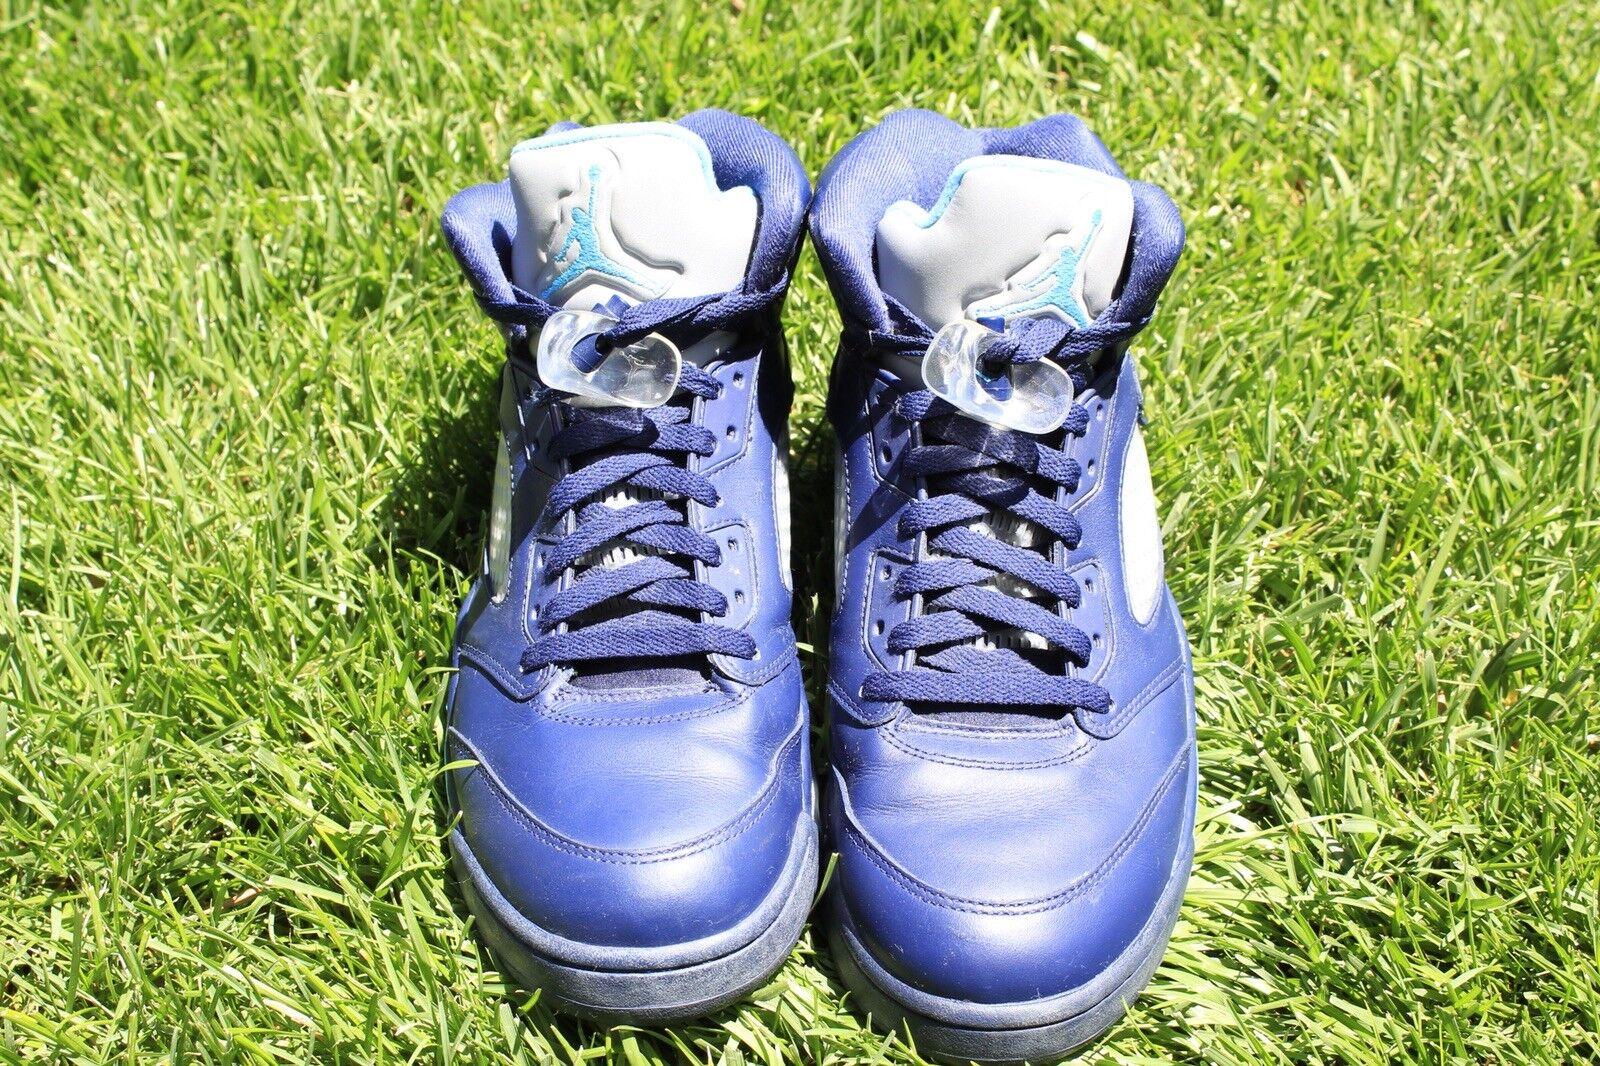 Air Jordan 5 Retro BG 'Pre-Grape' Midnight Navy Casual wild